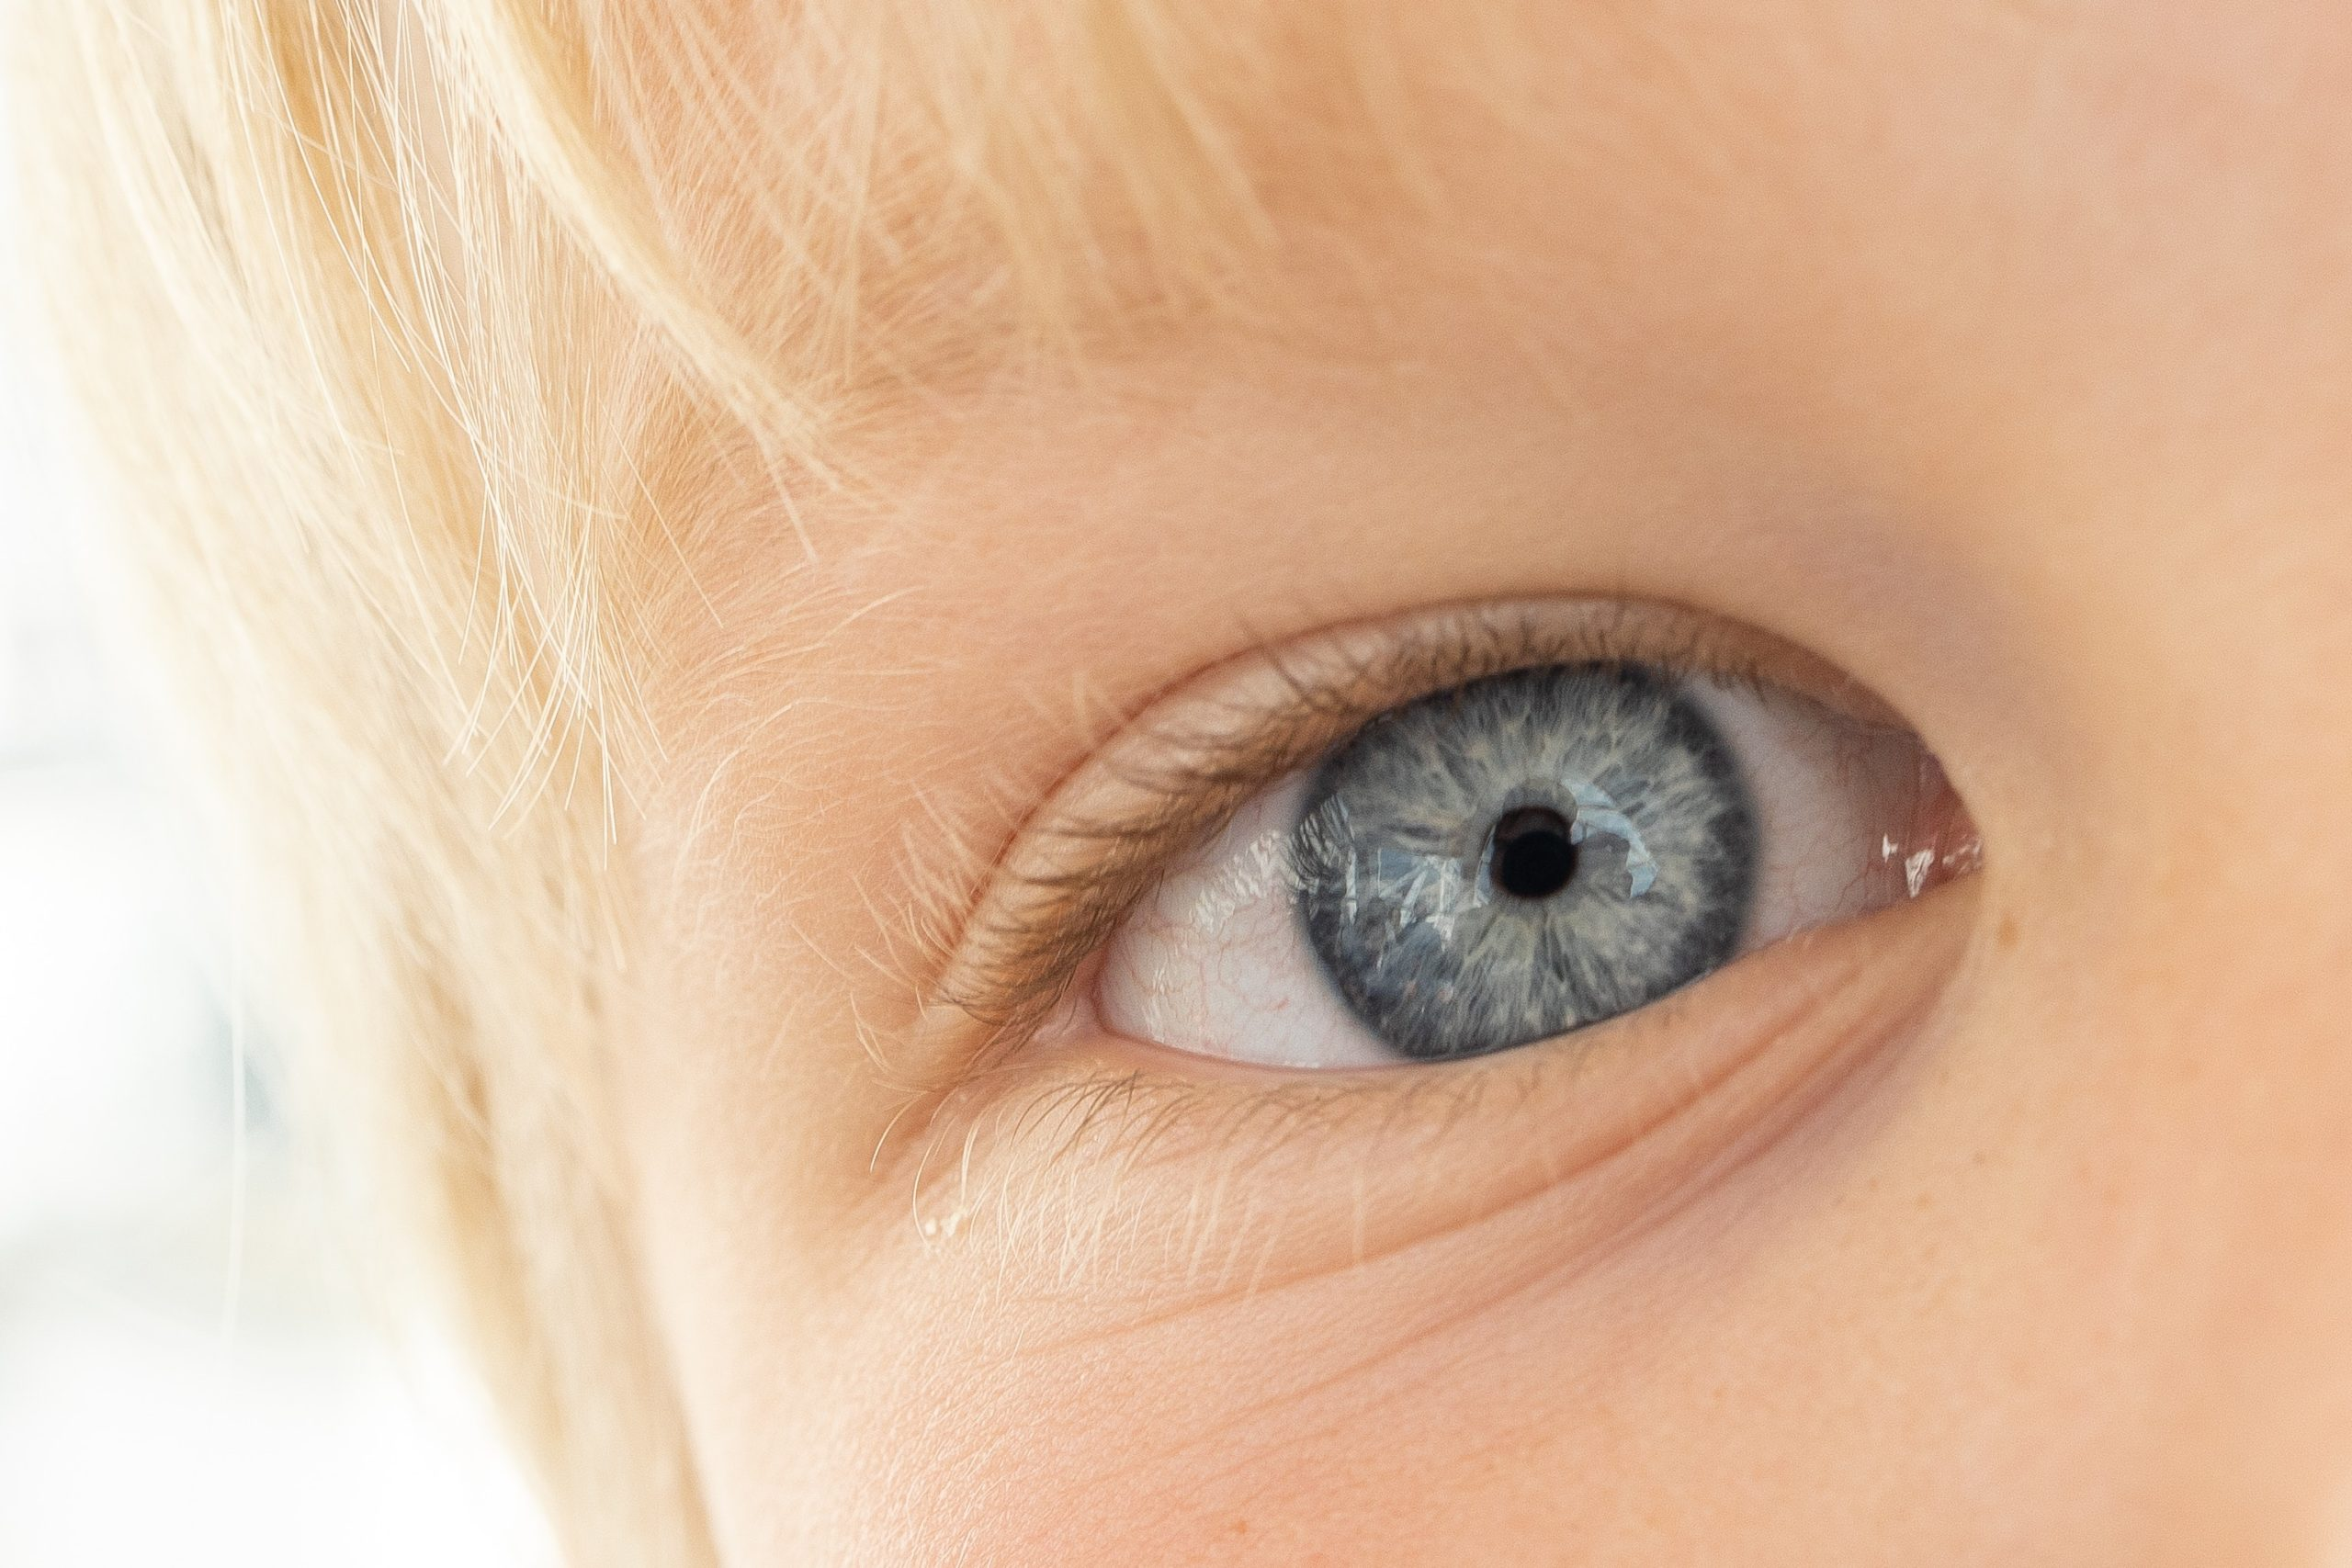 ojo niño - NeuroClass - visión y aprendizaje